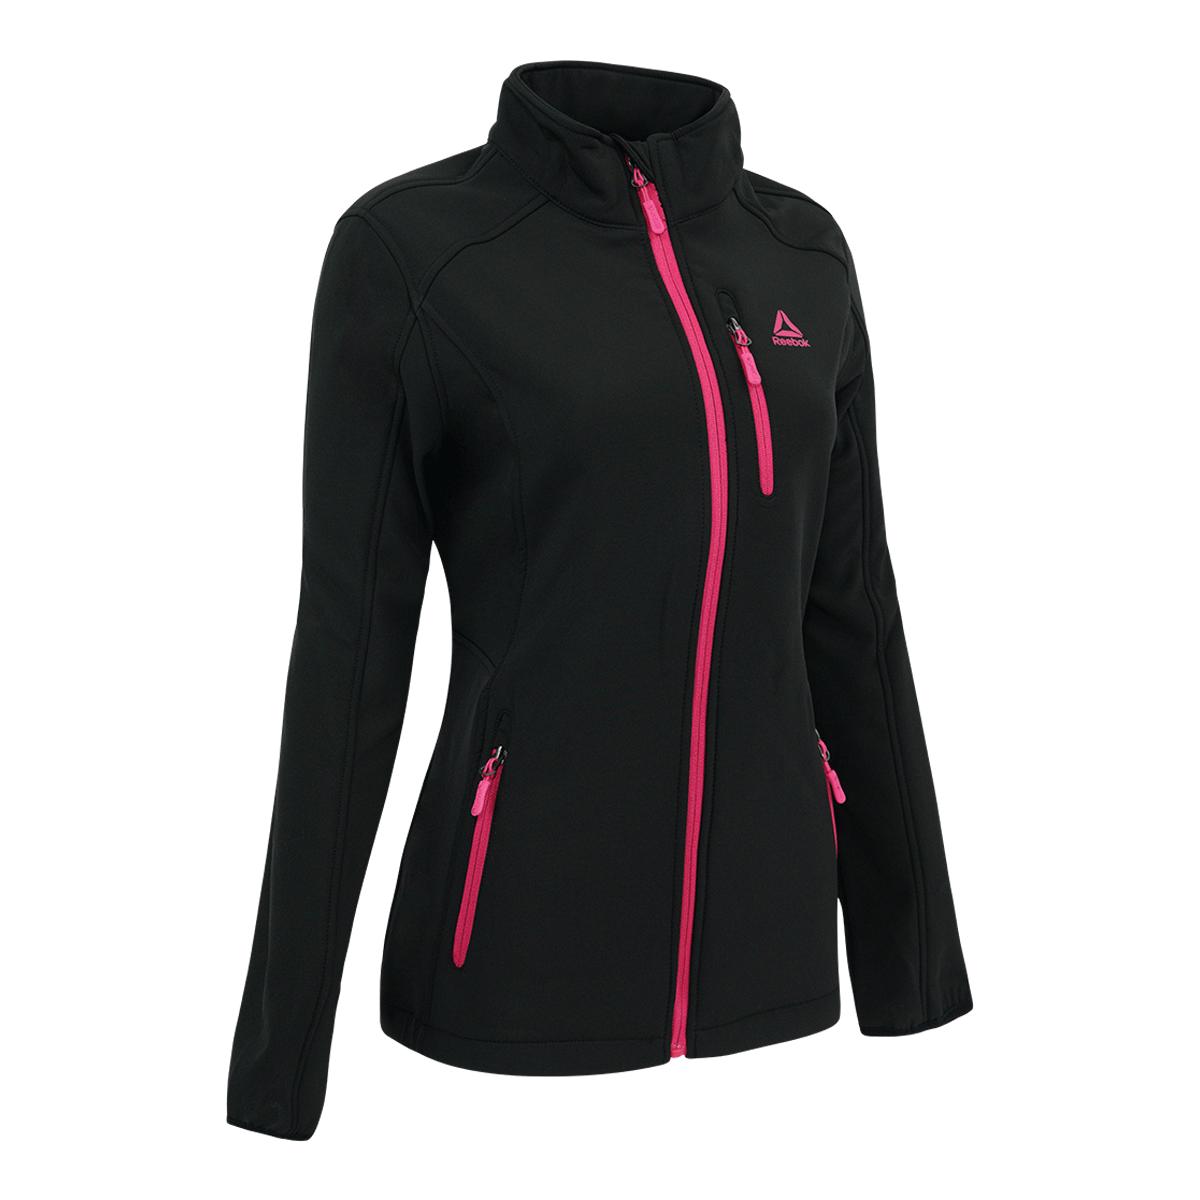 Reebok-Women-039-s-Full-Zip-Softshell-Jacket thumbnail 10